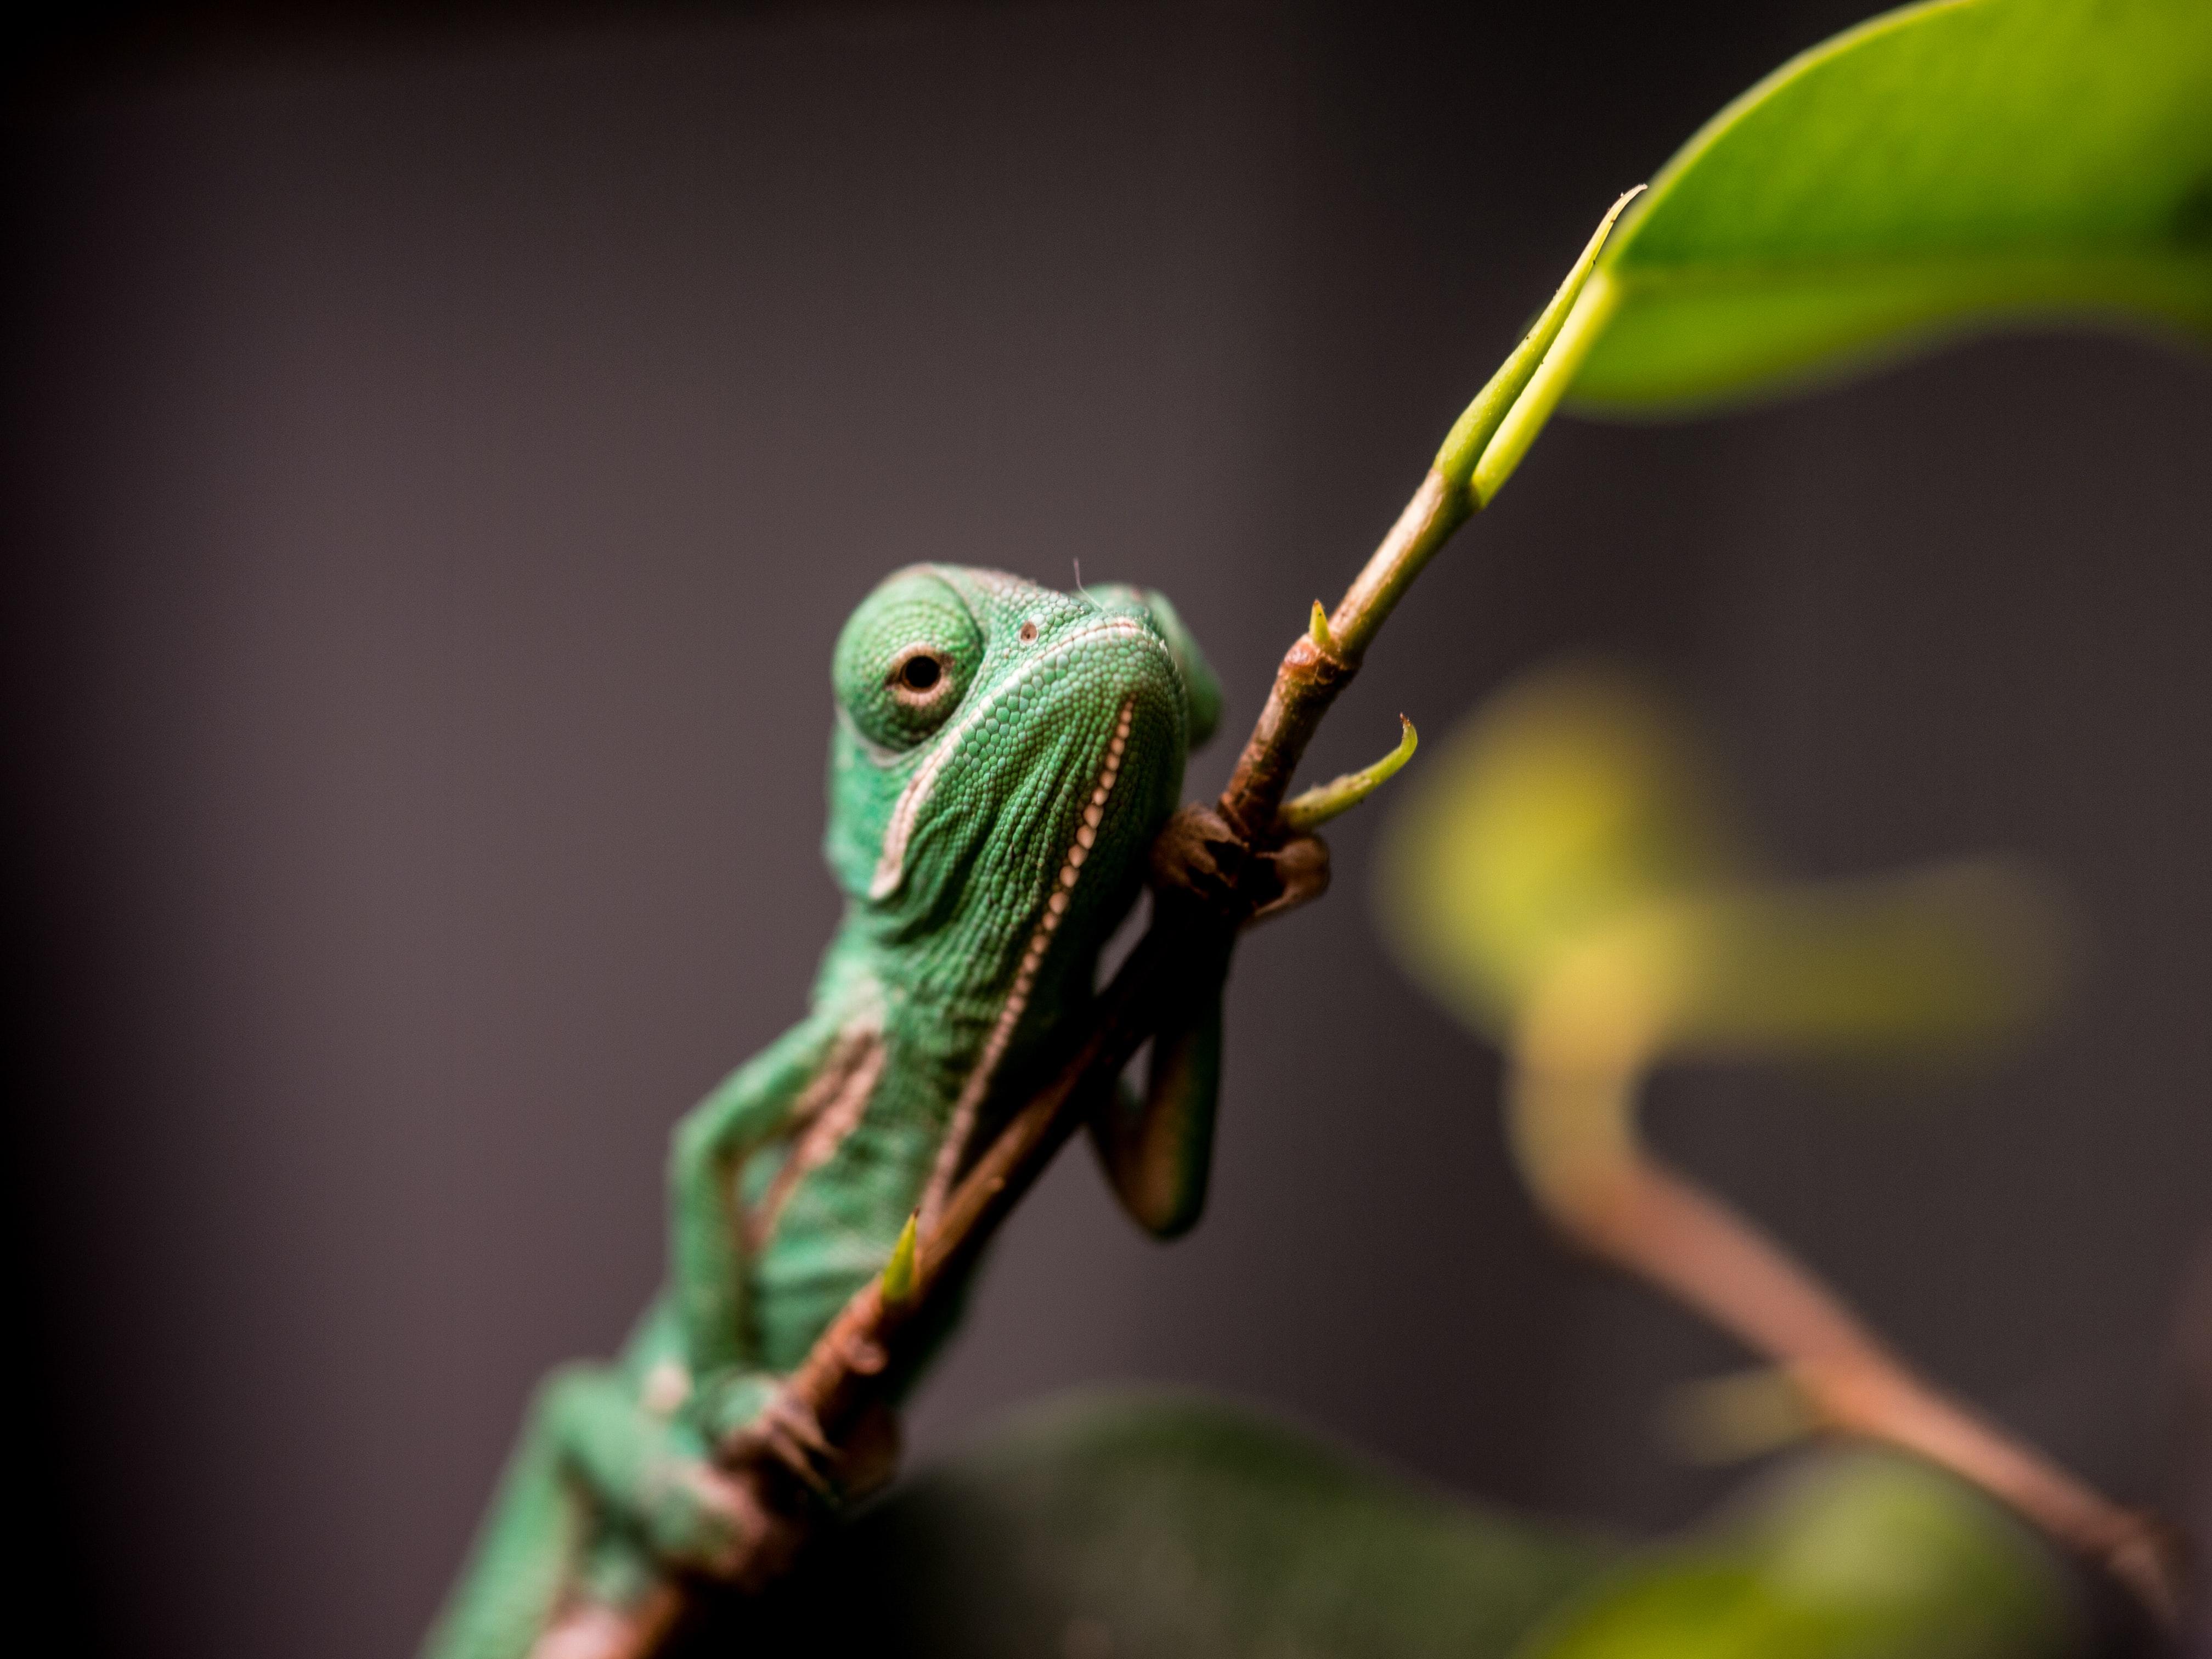 green lizard perches on twig